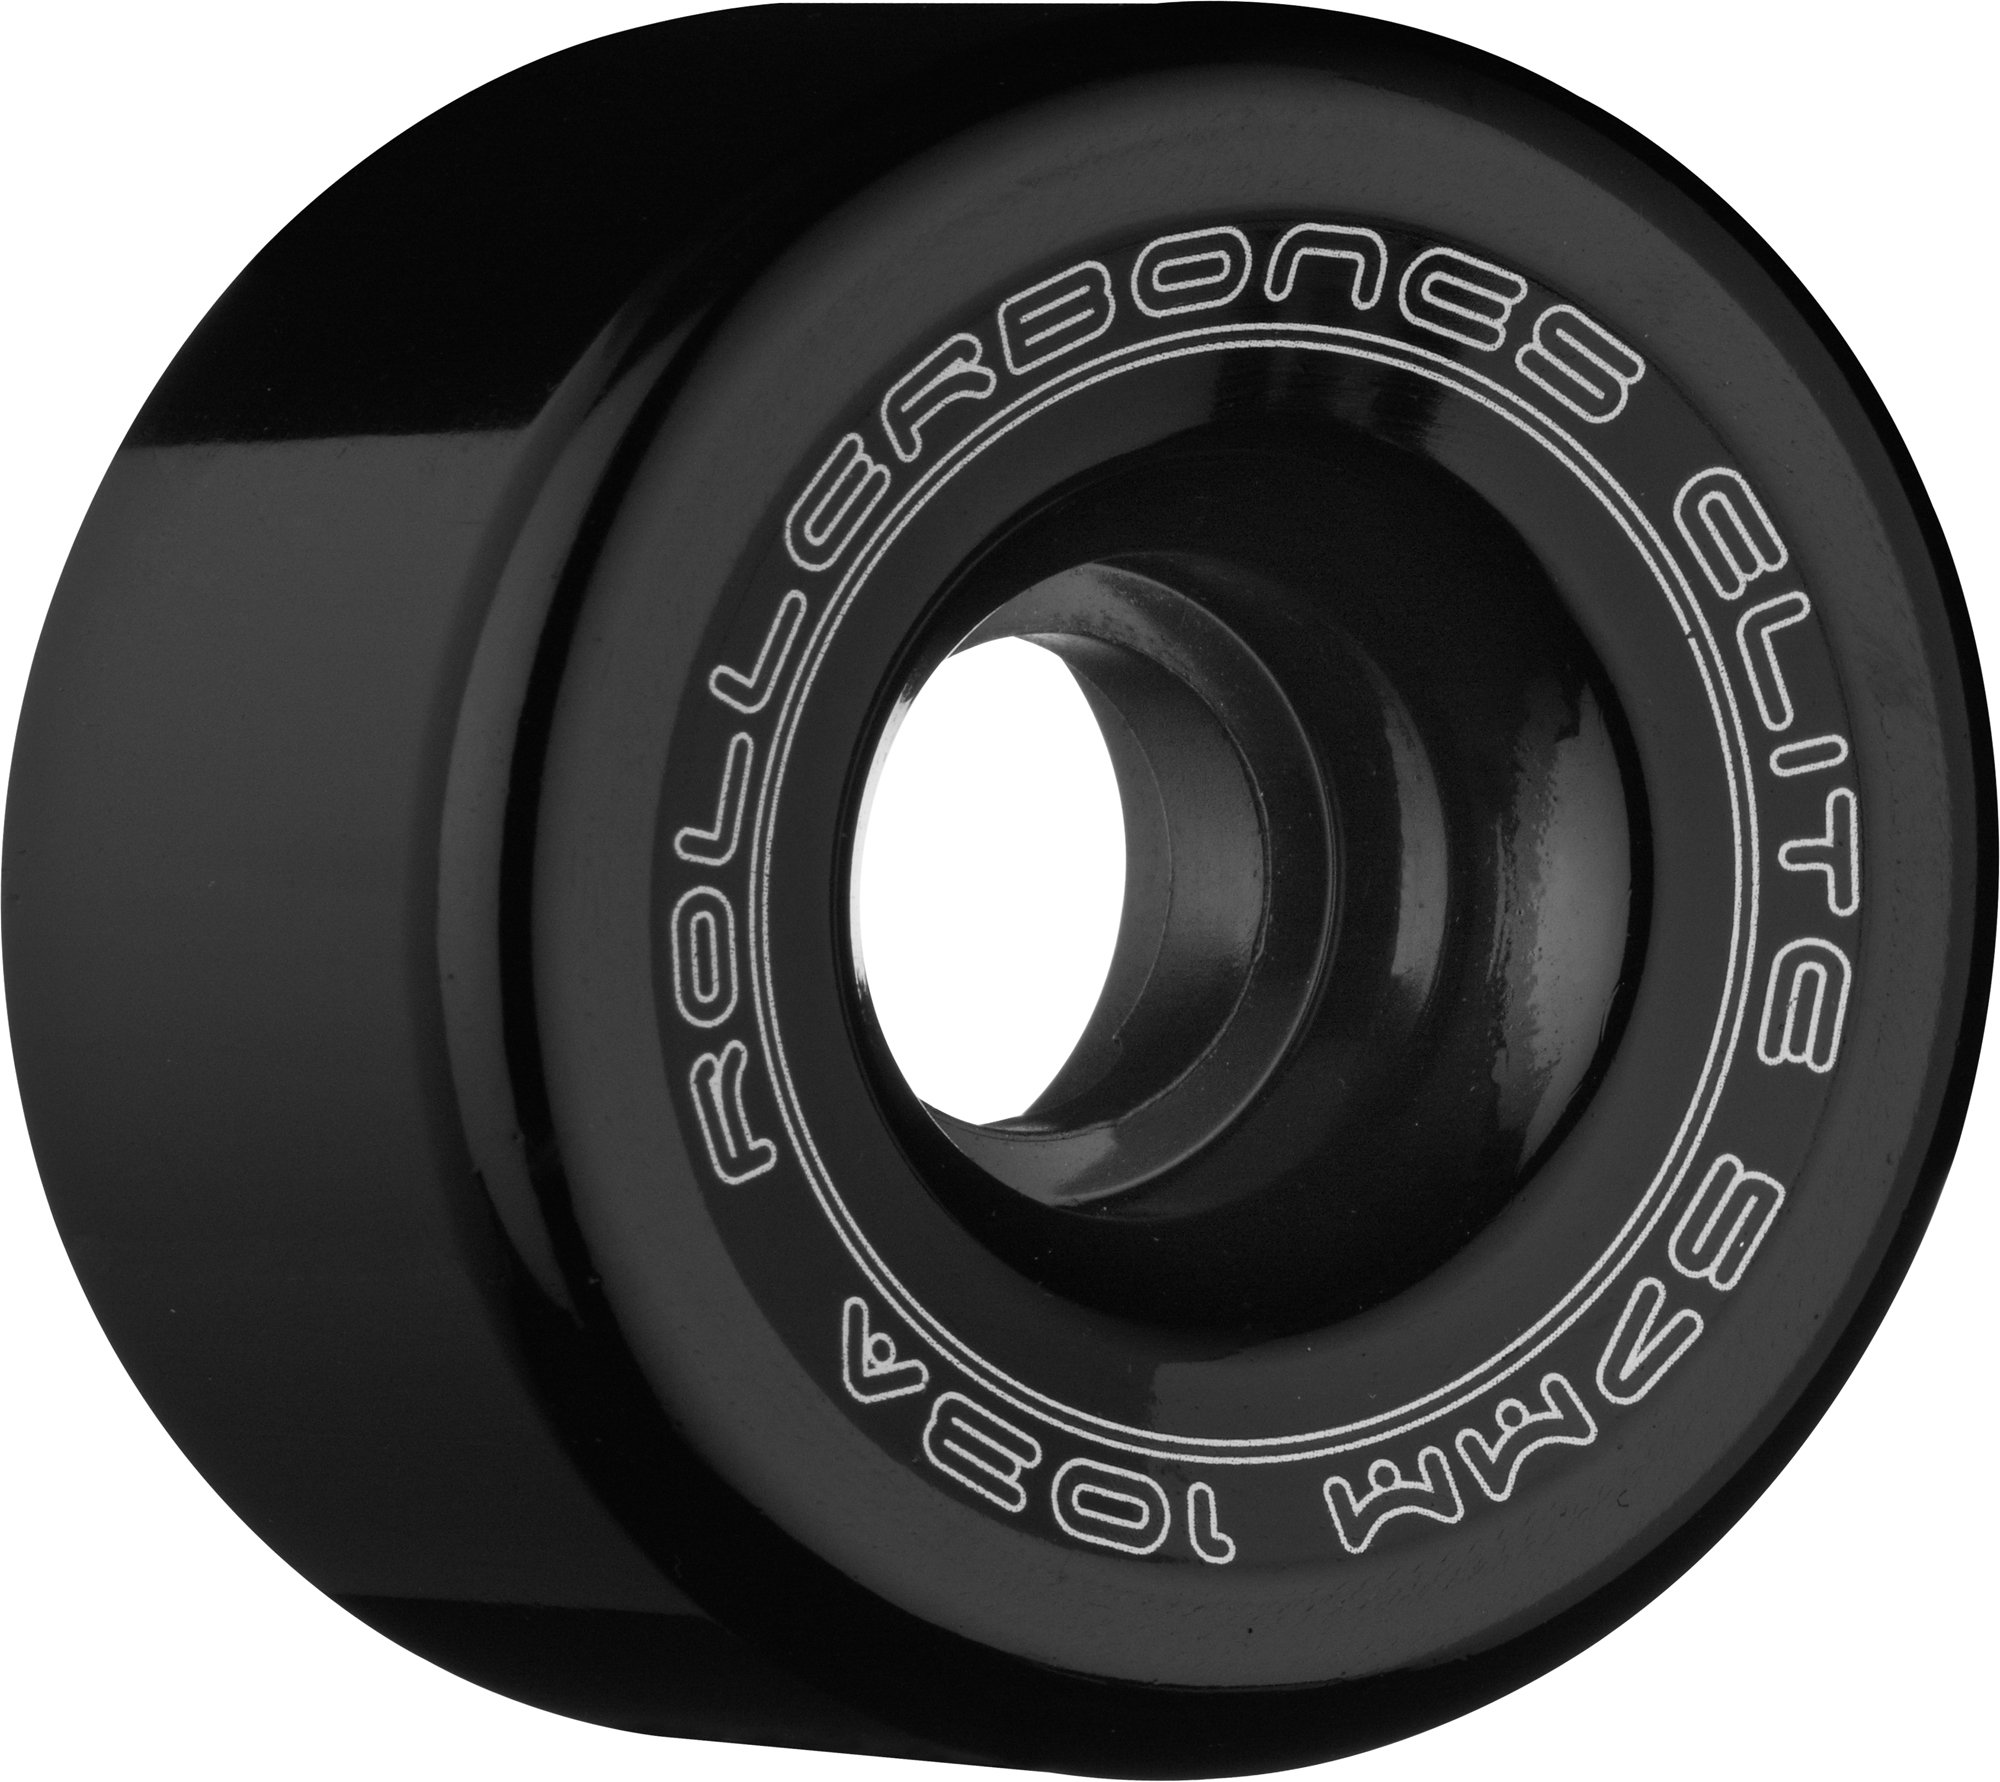 RollerBones Art Elite 103A Competition Roller Skate Wheels (Set of 8), Black, 57mm by RollerBones